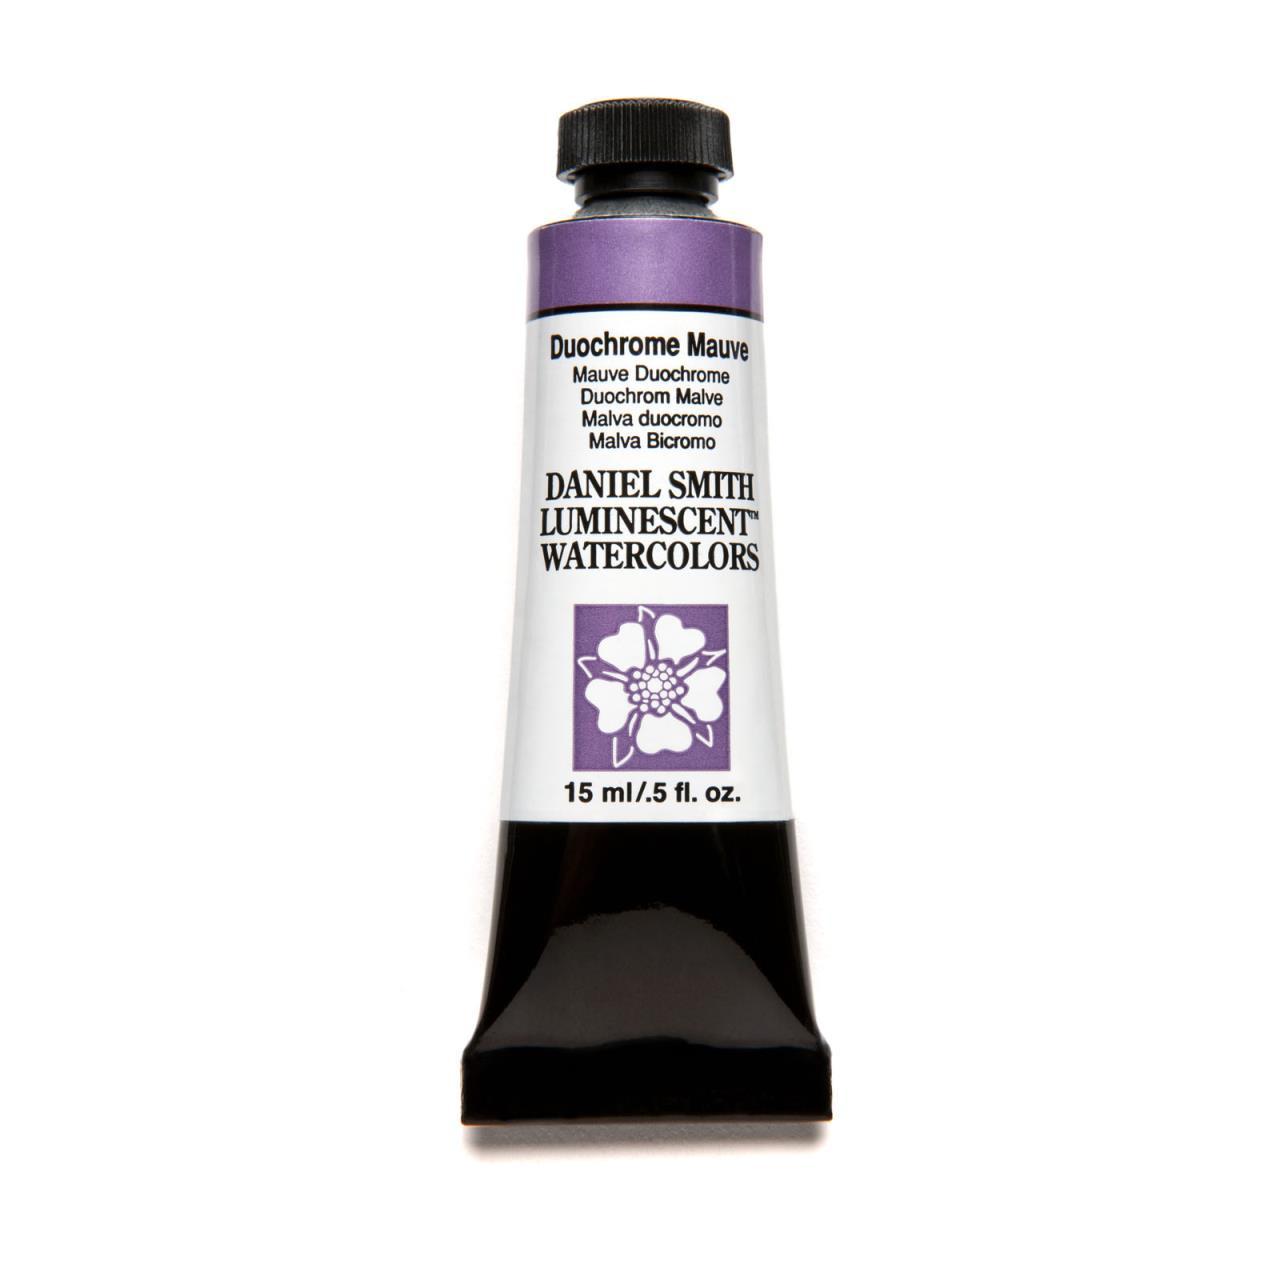 Duochrome Mauve (Luminescent), DANIEL SMITH Extra Fine Watercolors 15ml Tubes -